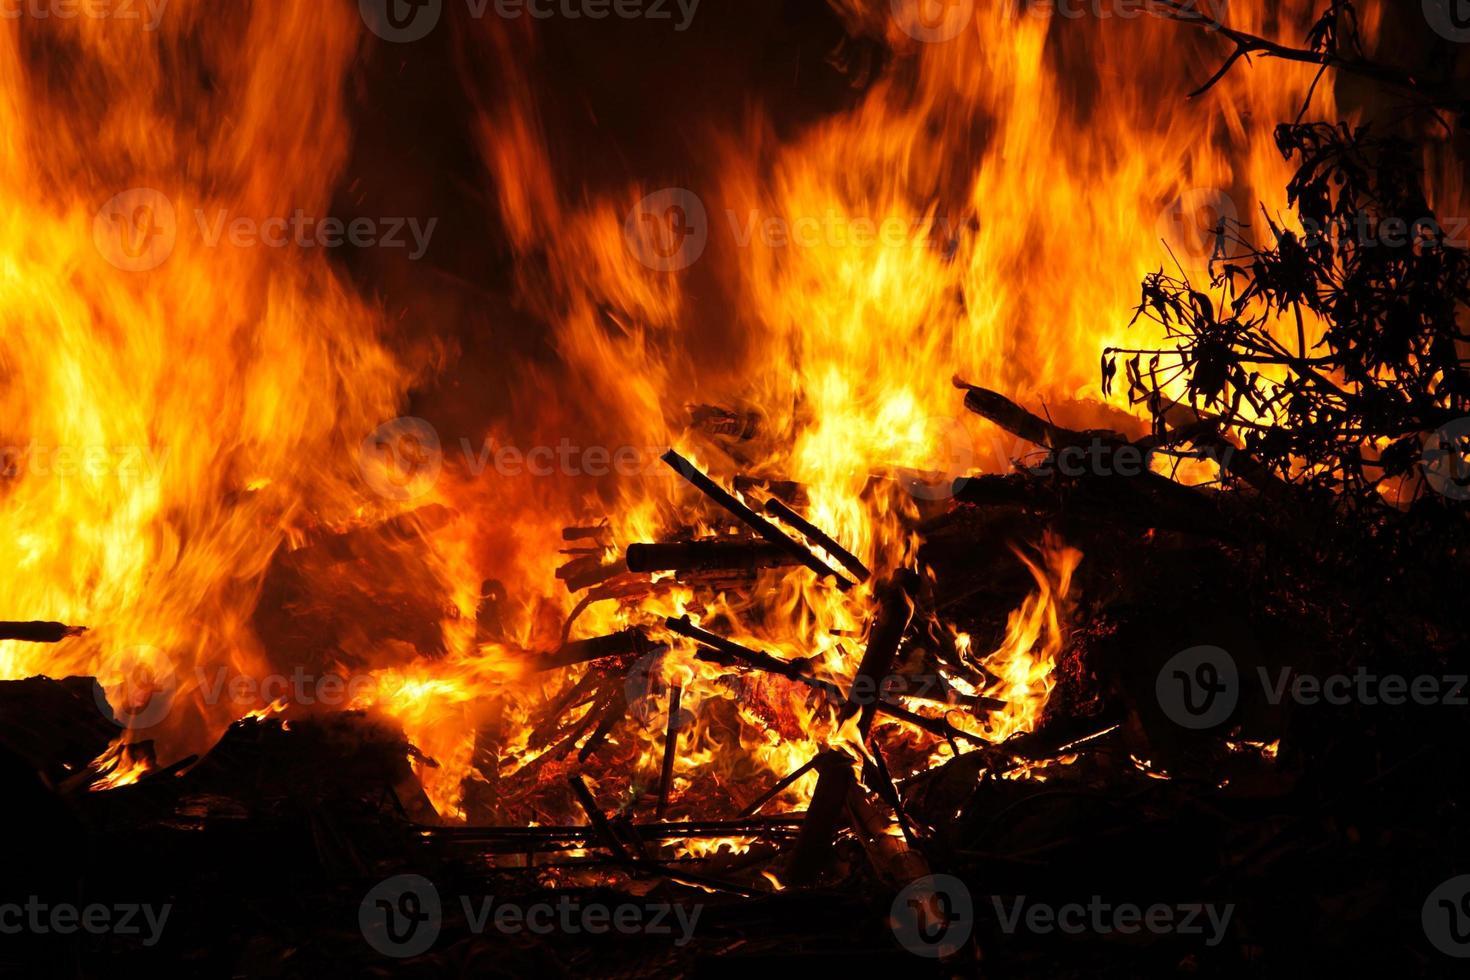 brennendes Feuer foto